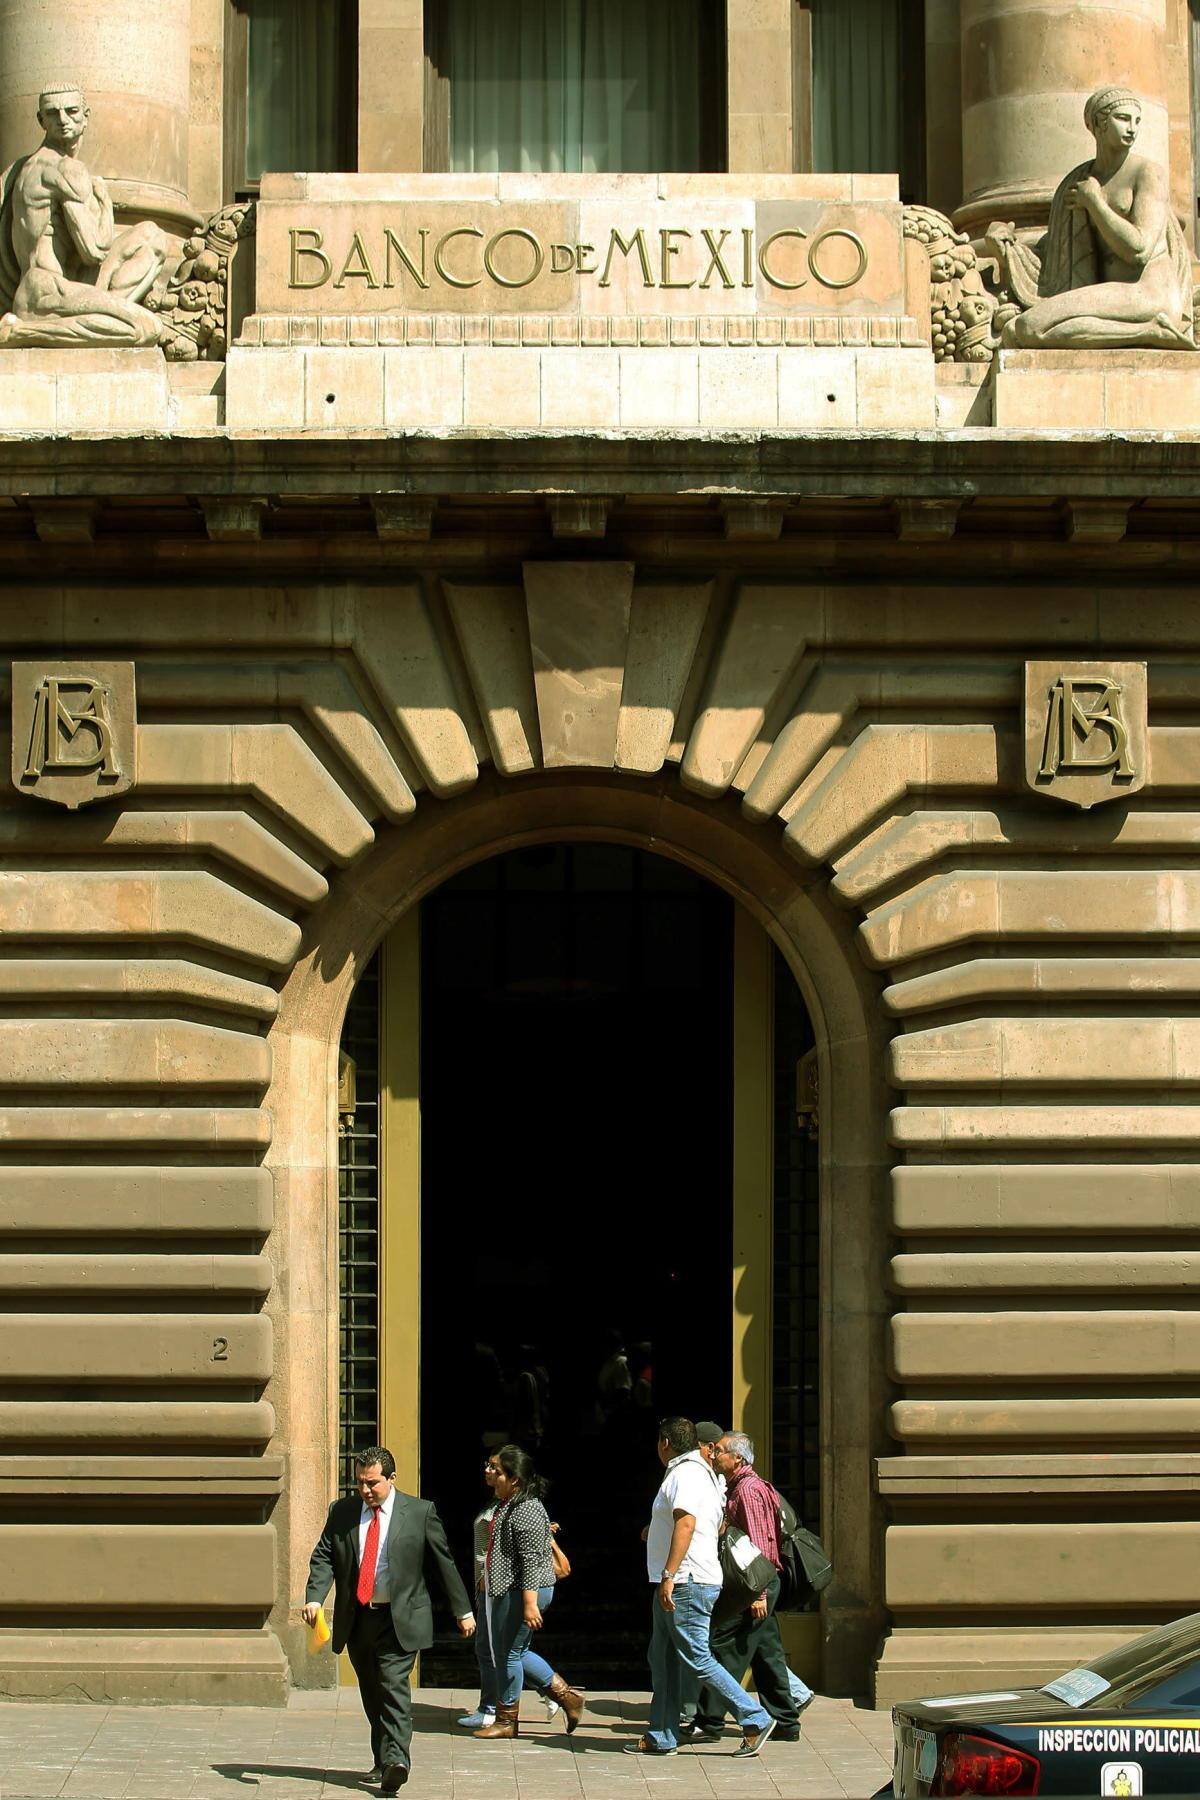 Banco de México warns of rising inflation and external pressures